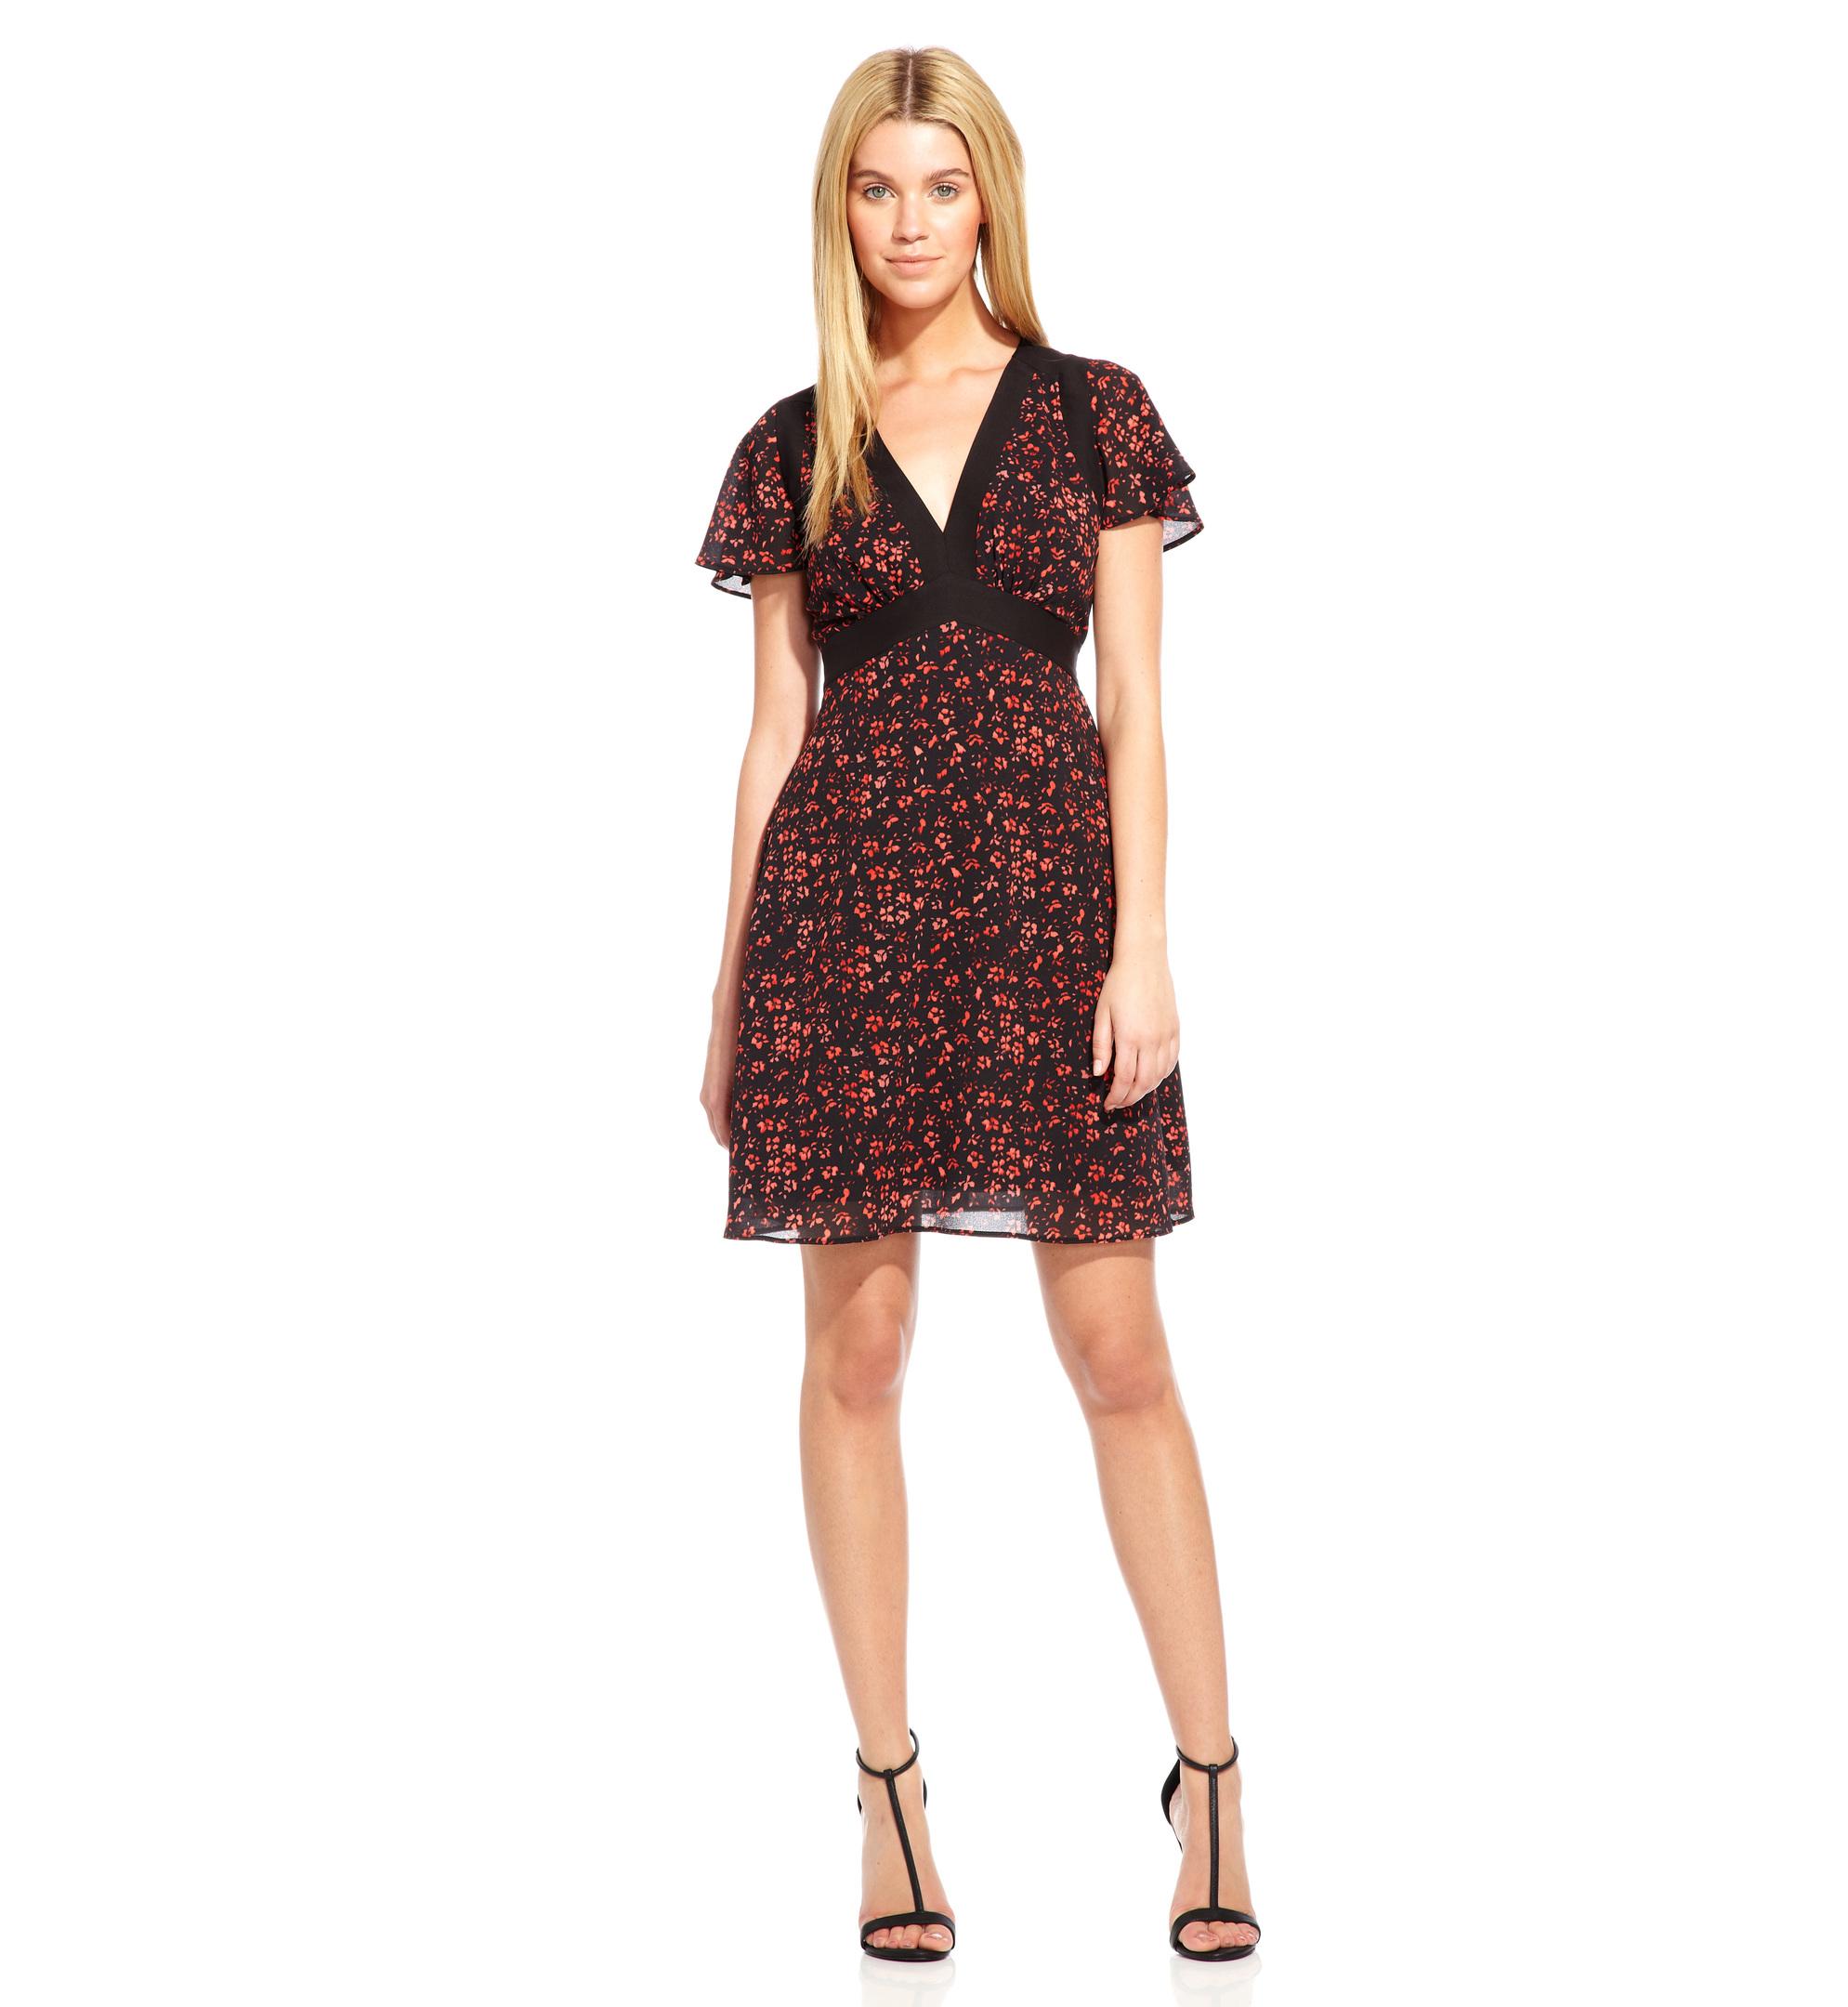 Ossie Clark London Brockwell Dress, £99